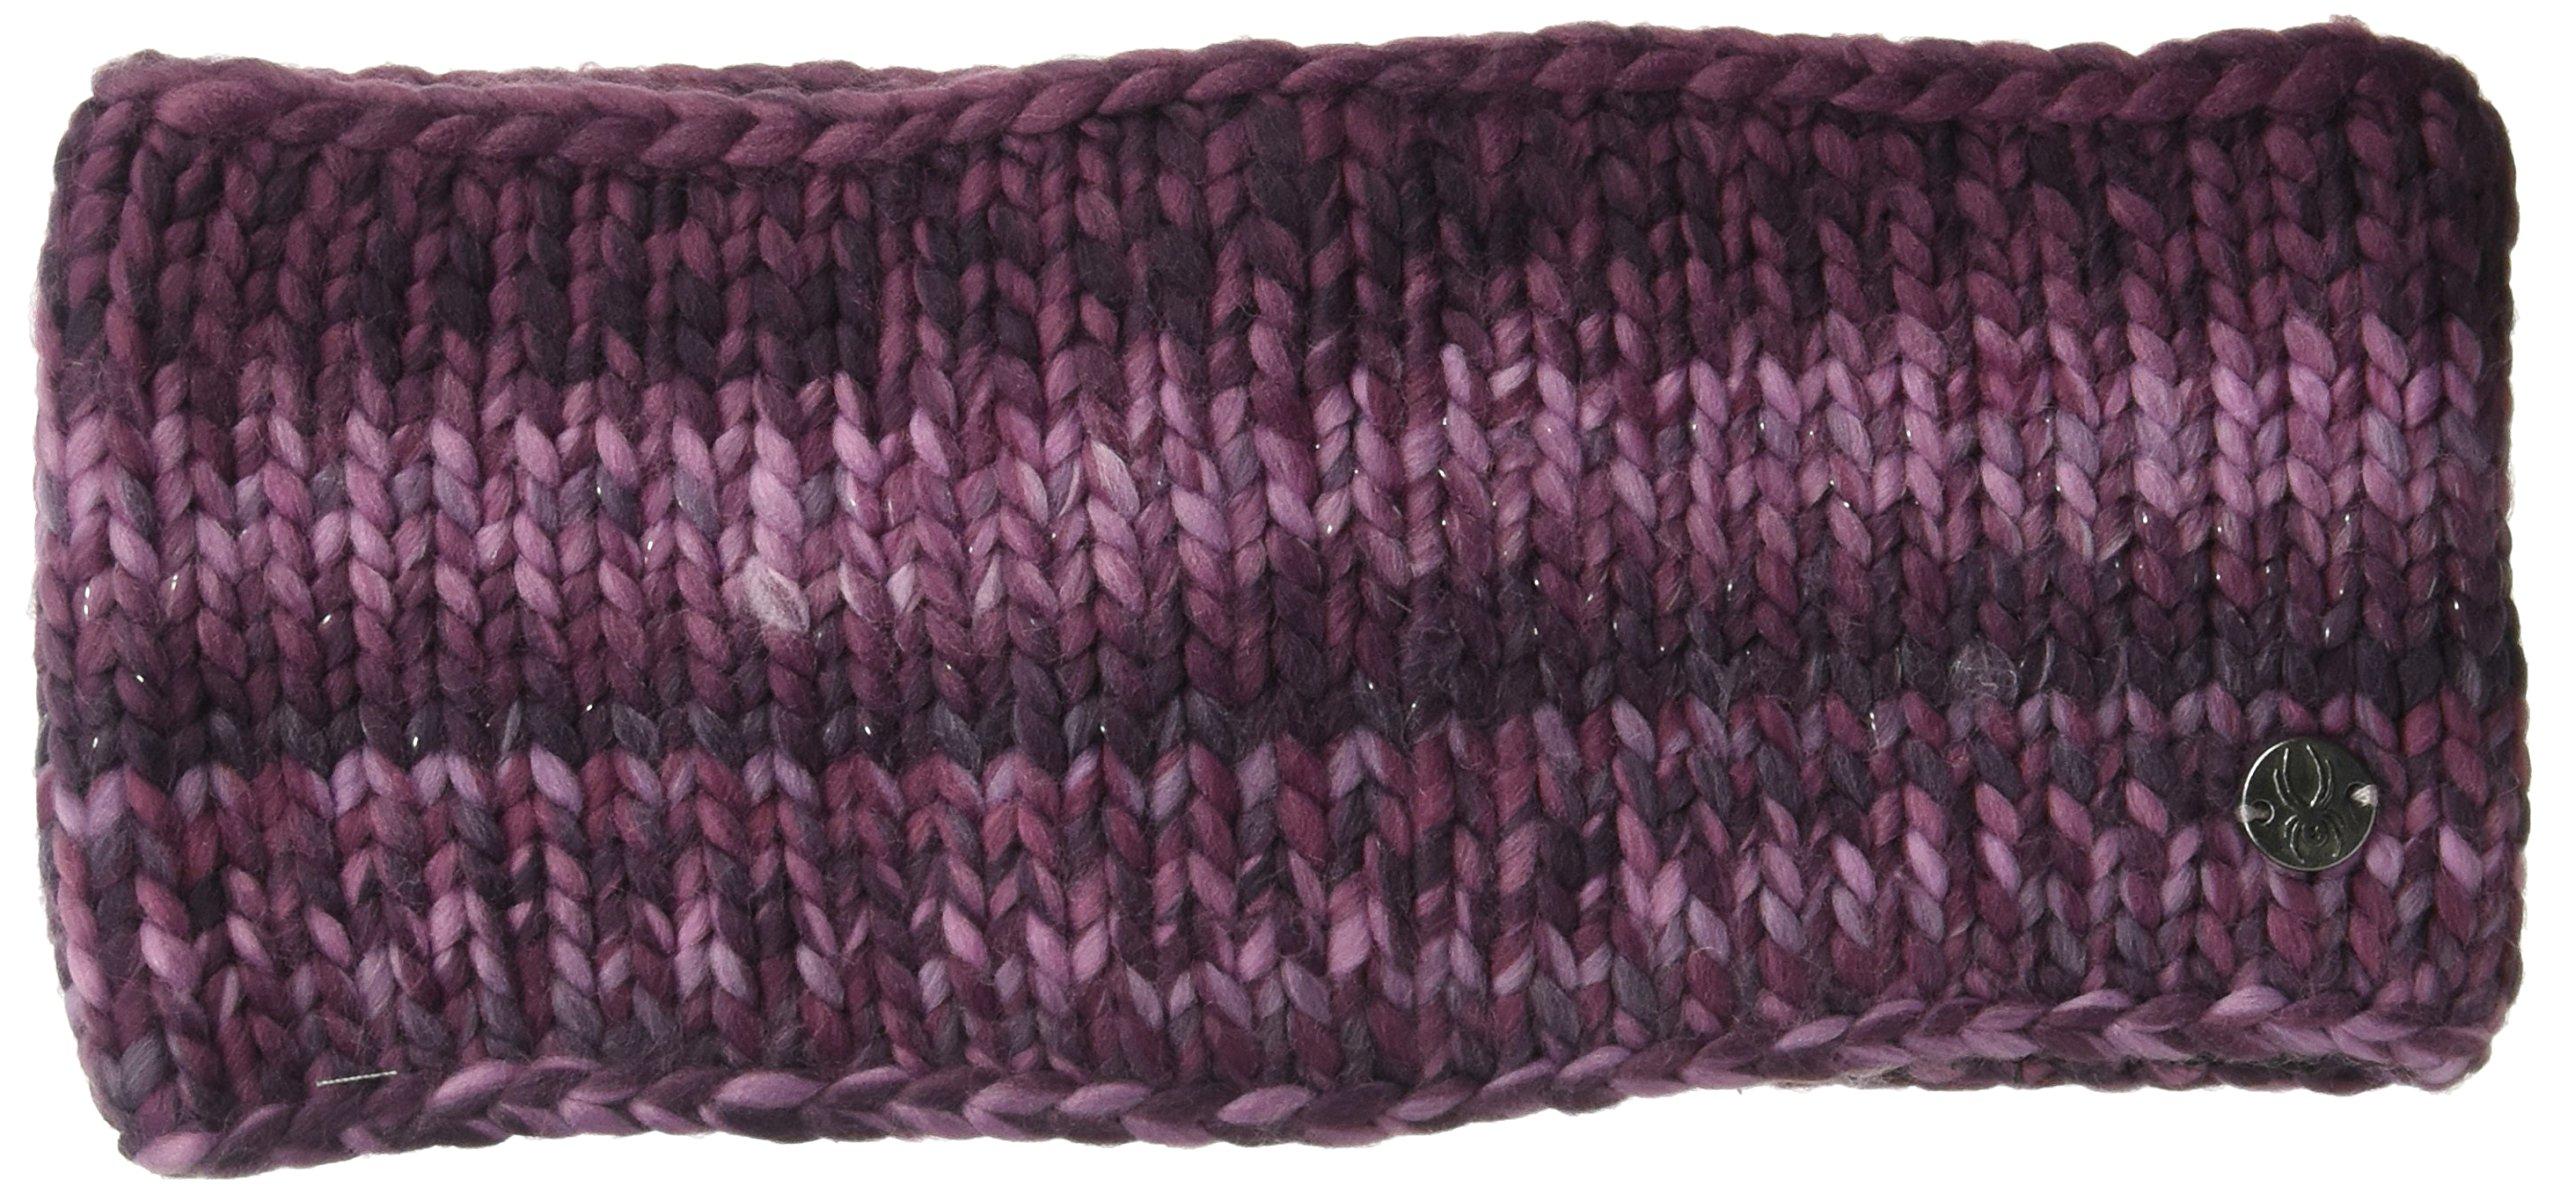 Spyder Women's Twisty Headband, Nightshade/Amaranth/Grape, One Size